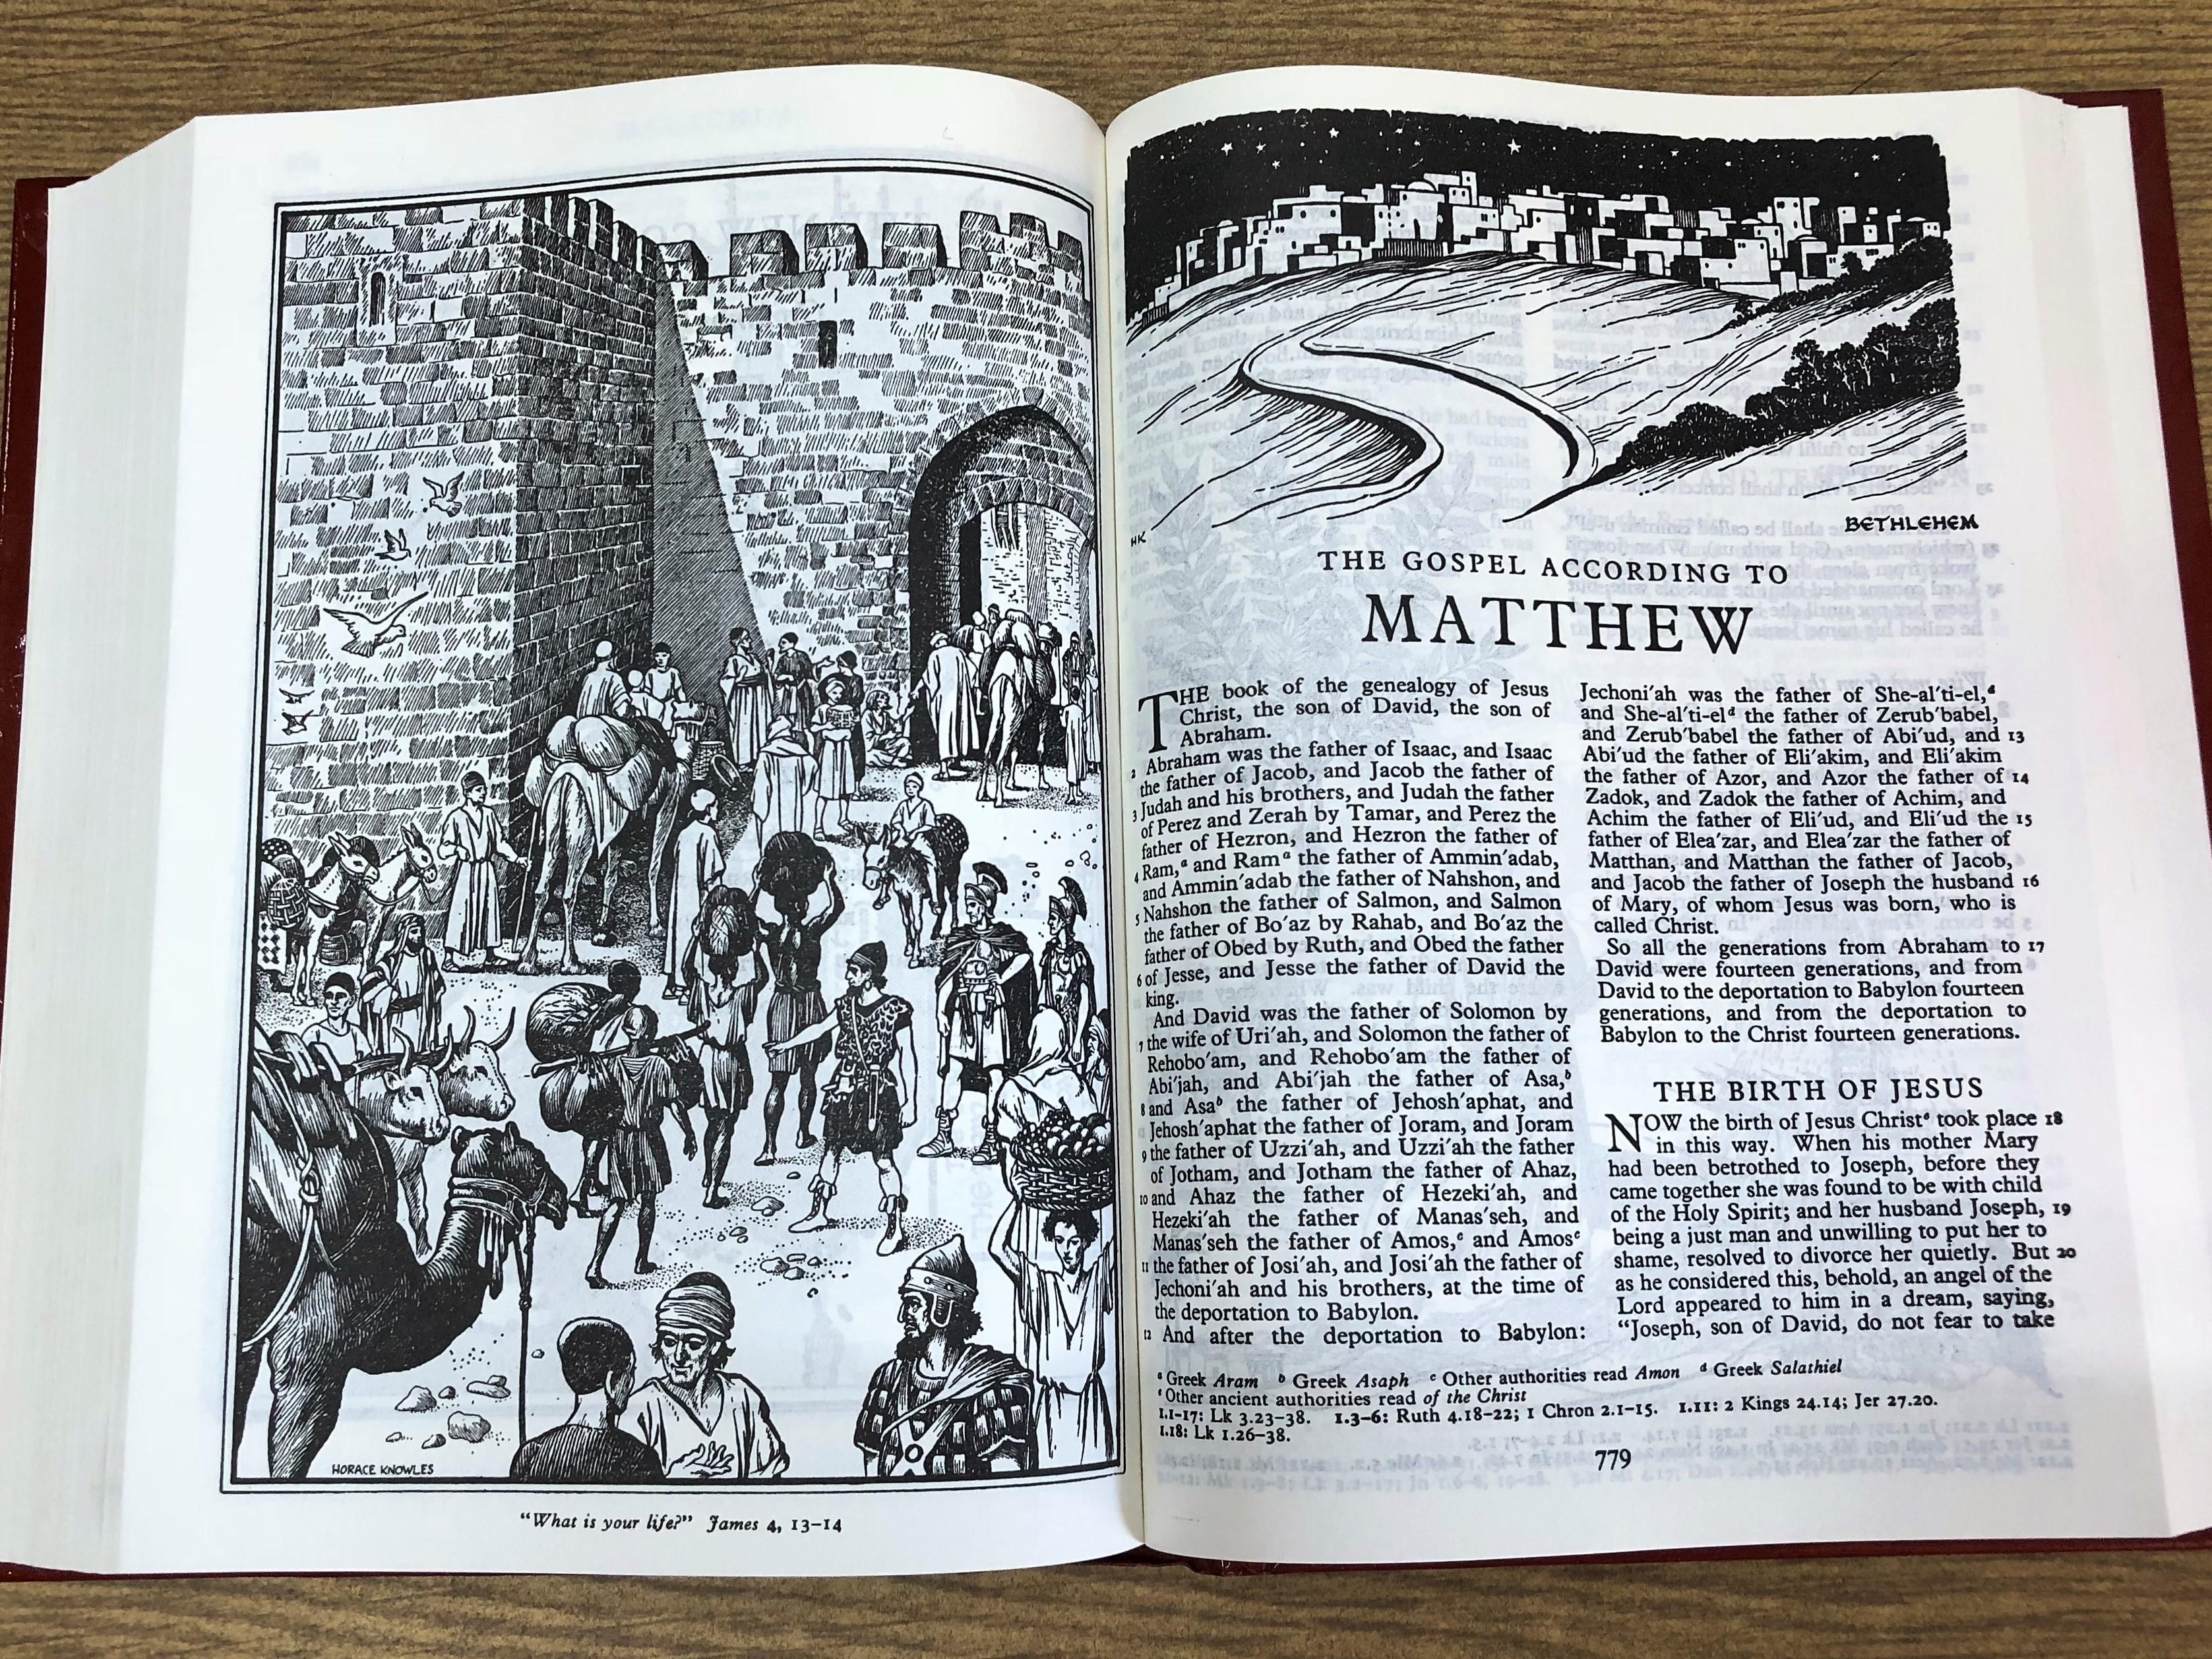 english-bible-revised-standard-version-rsv-burg-10-.jpg